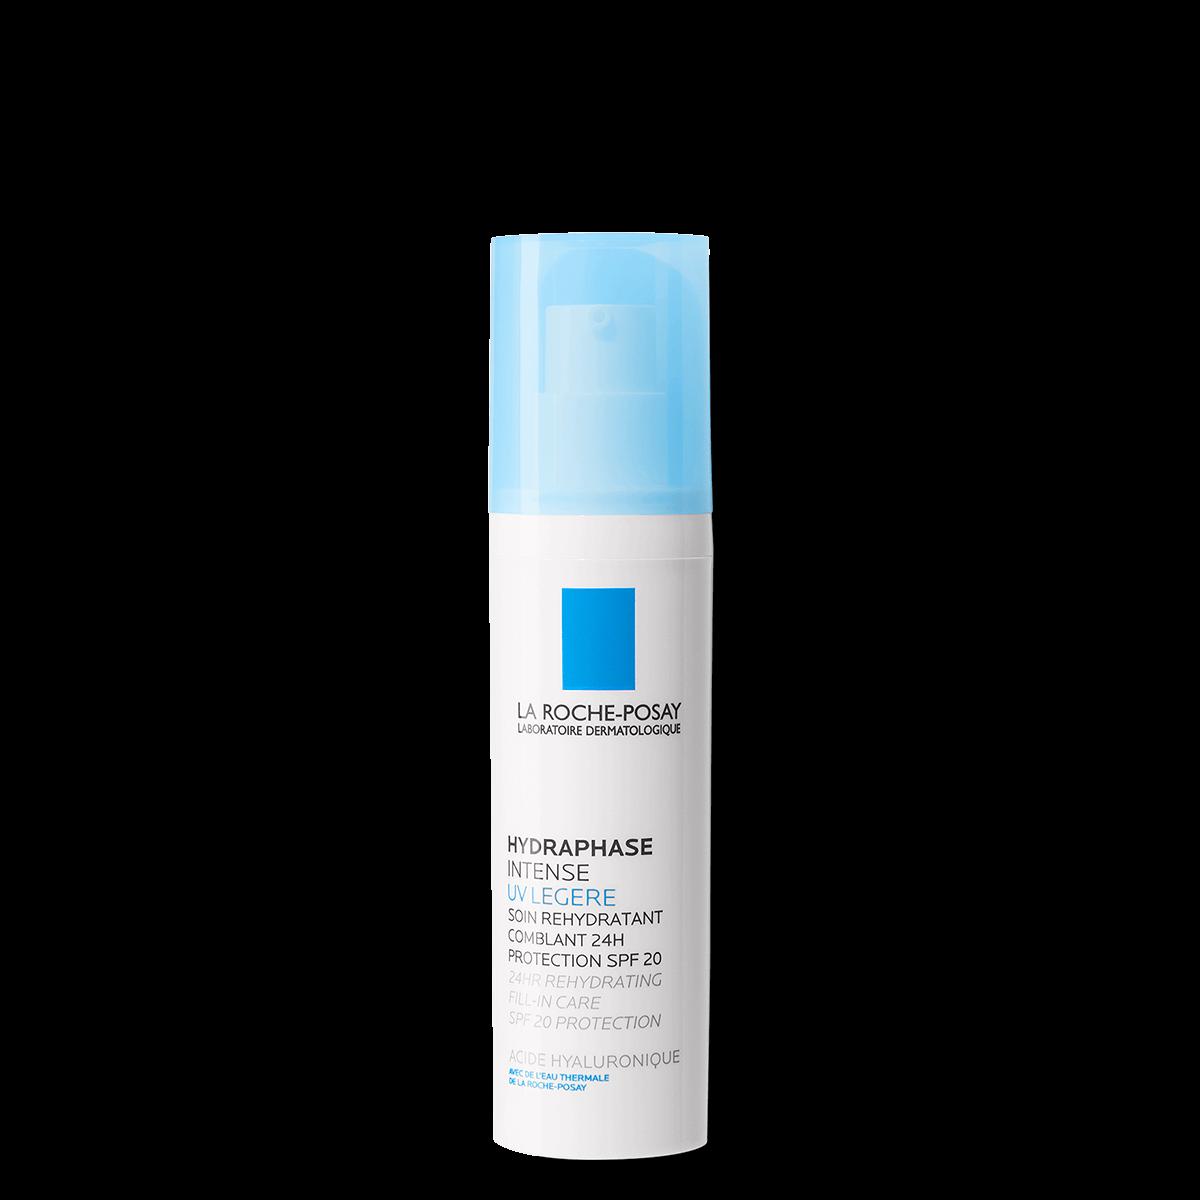 La Roche Posay ProductPage Hydraphase UV Intense Light Spf20 50ml 3337